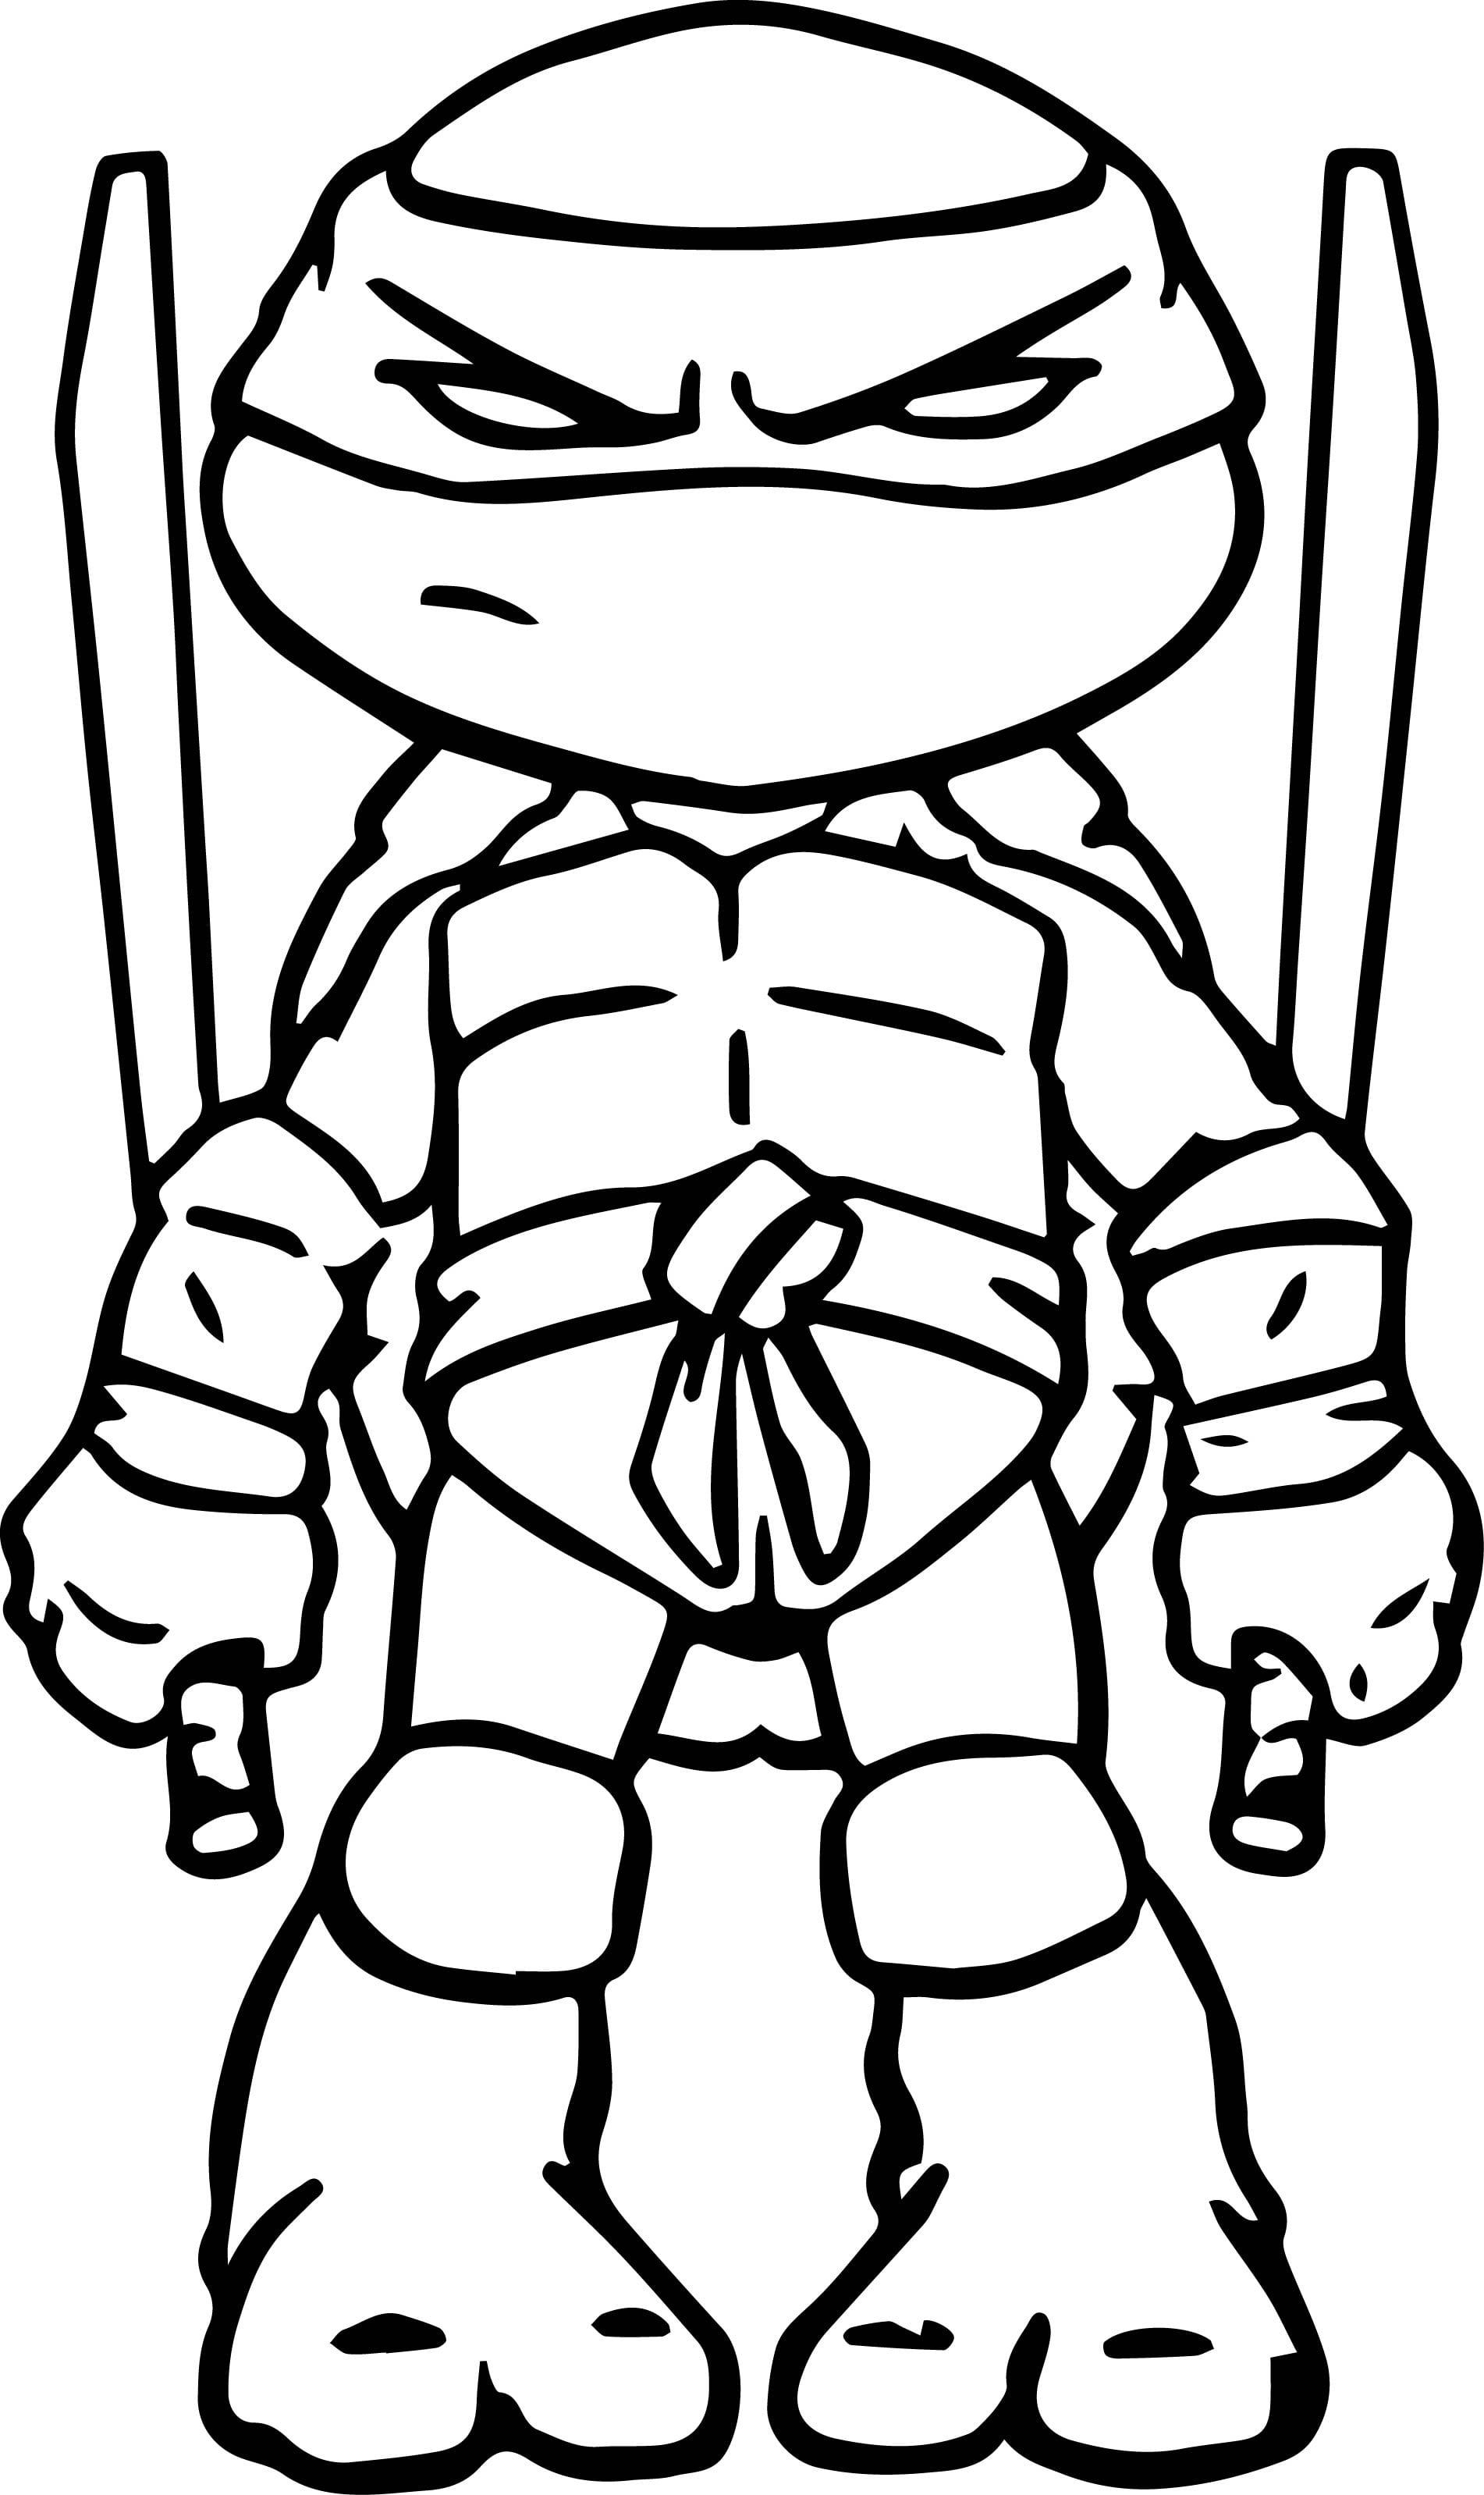 Special Leonardo Teenage Mutant Ninja Turtles Coloring Pages Ralph